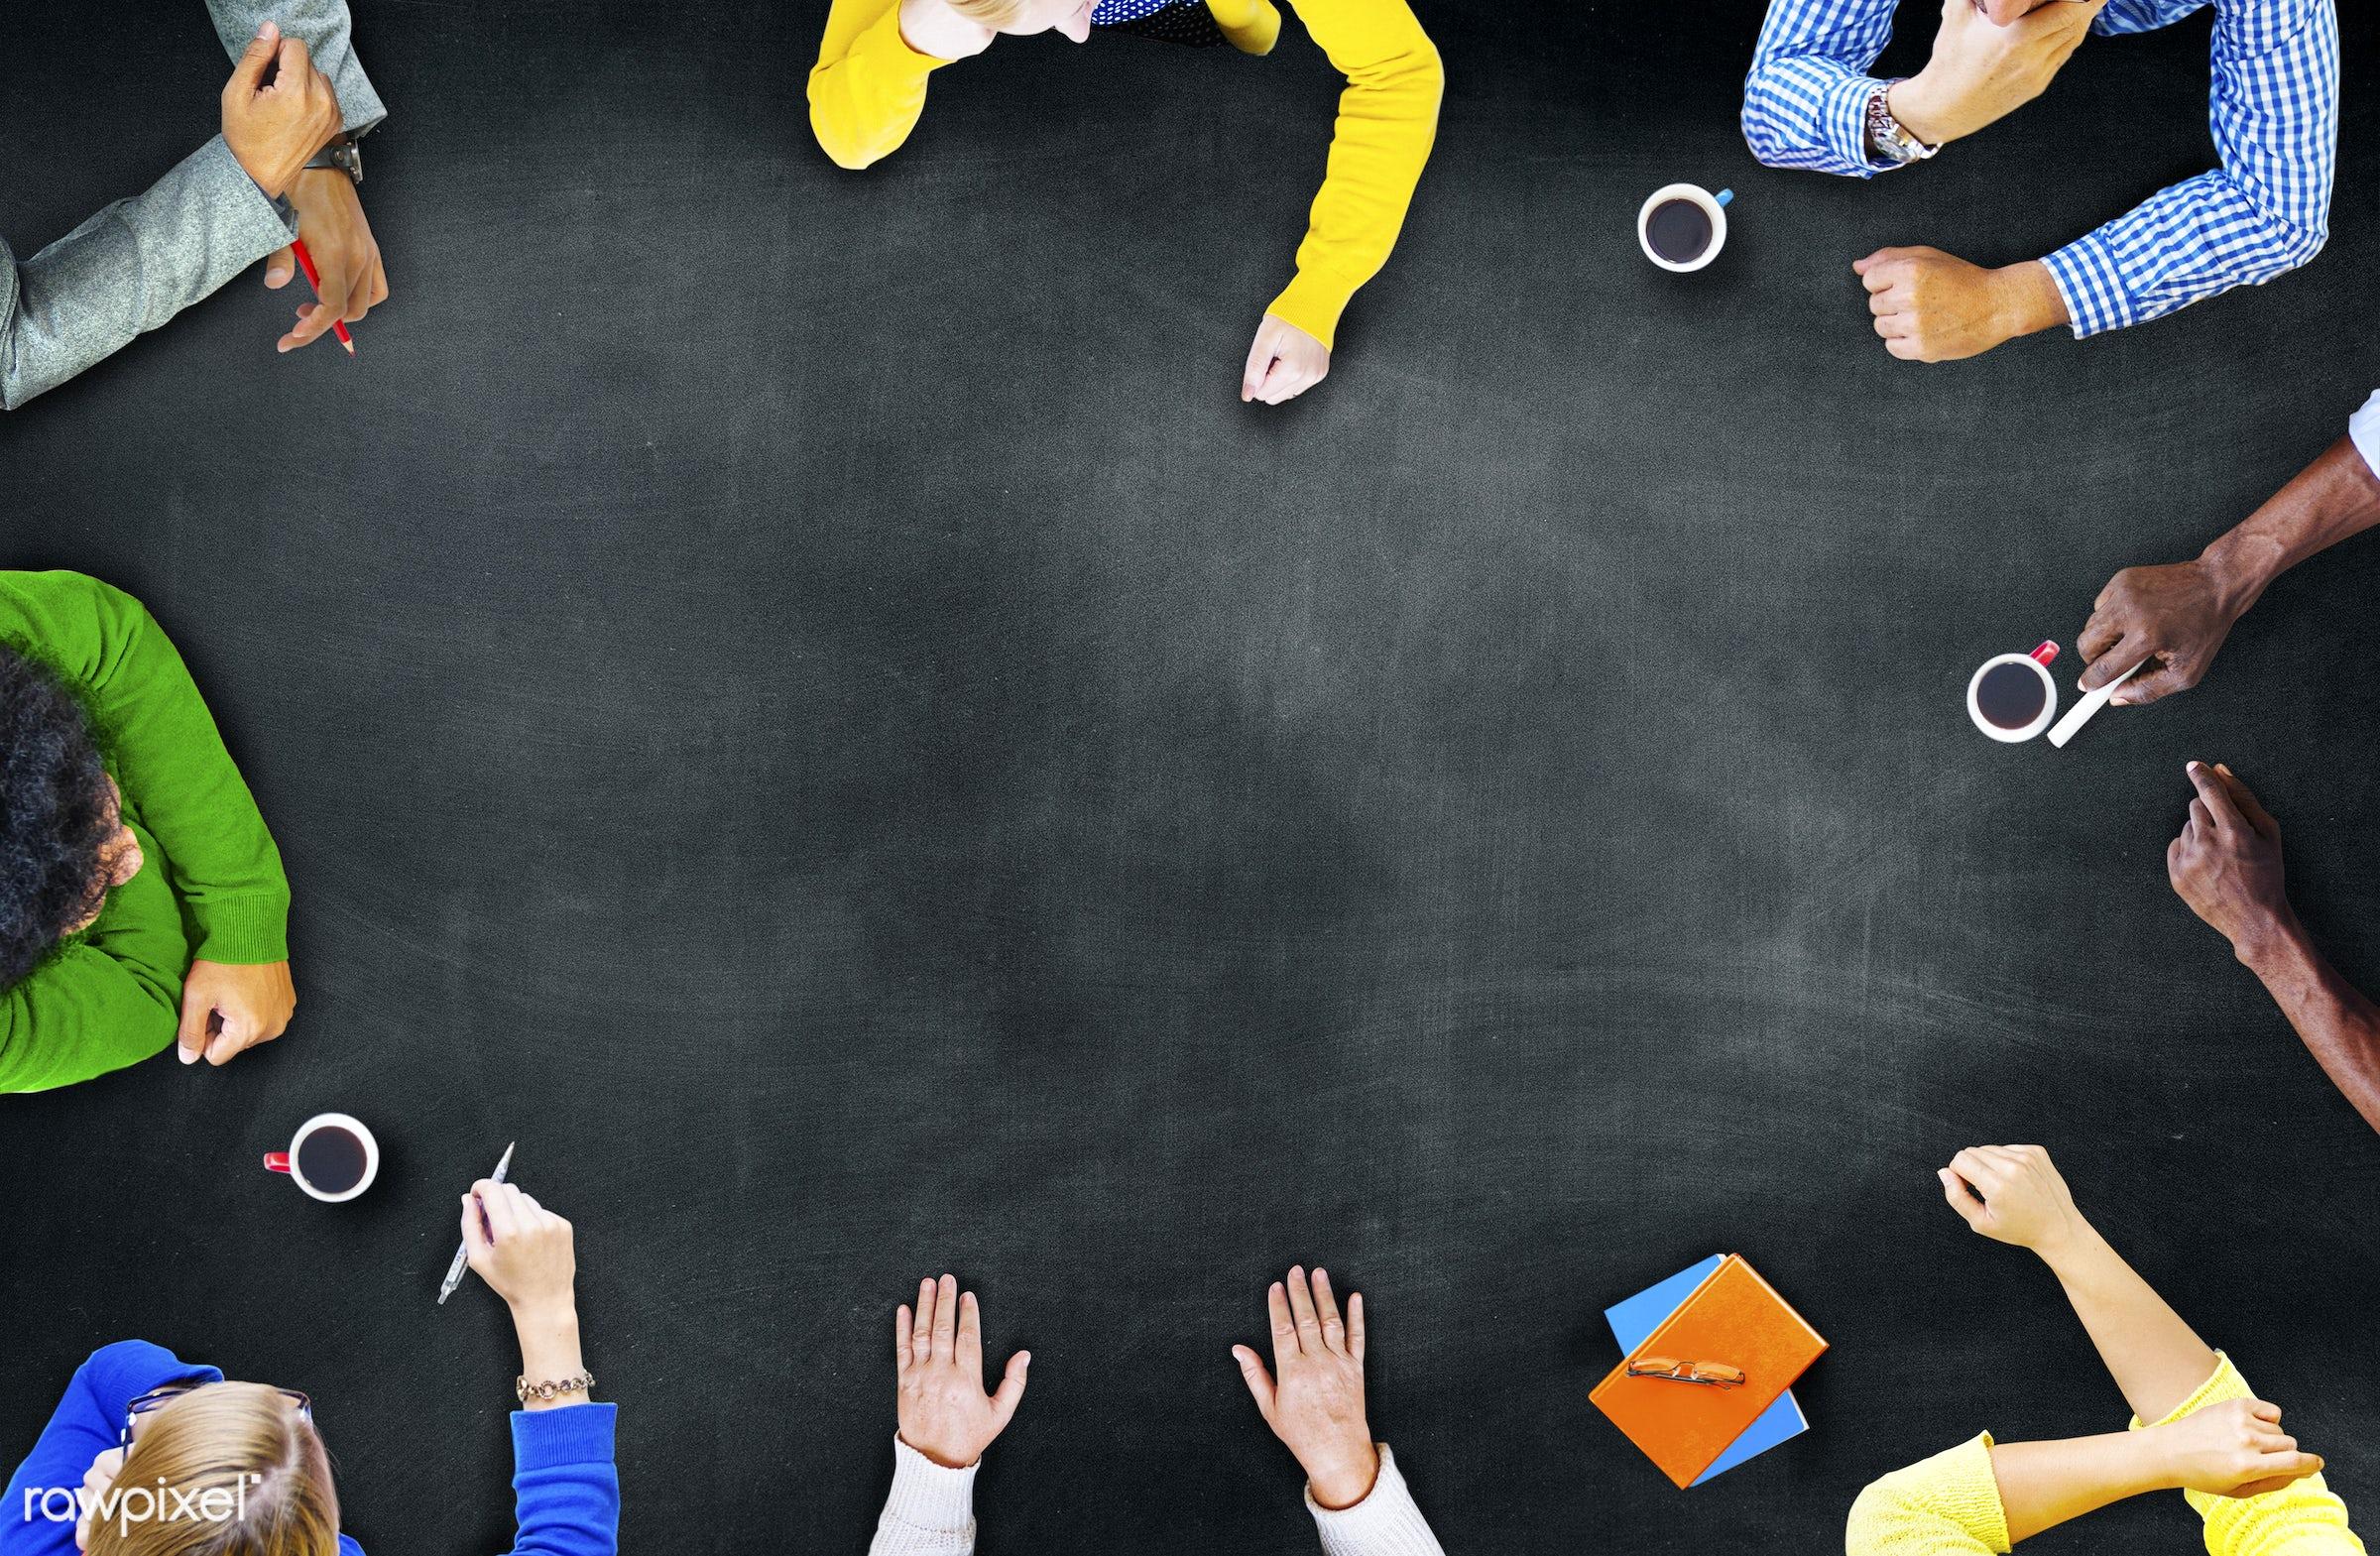 aerial view, blackboard, blank, board, brainstorm, brainstorming, businessmen, businesswomen, chalkboard, coffee, college,...